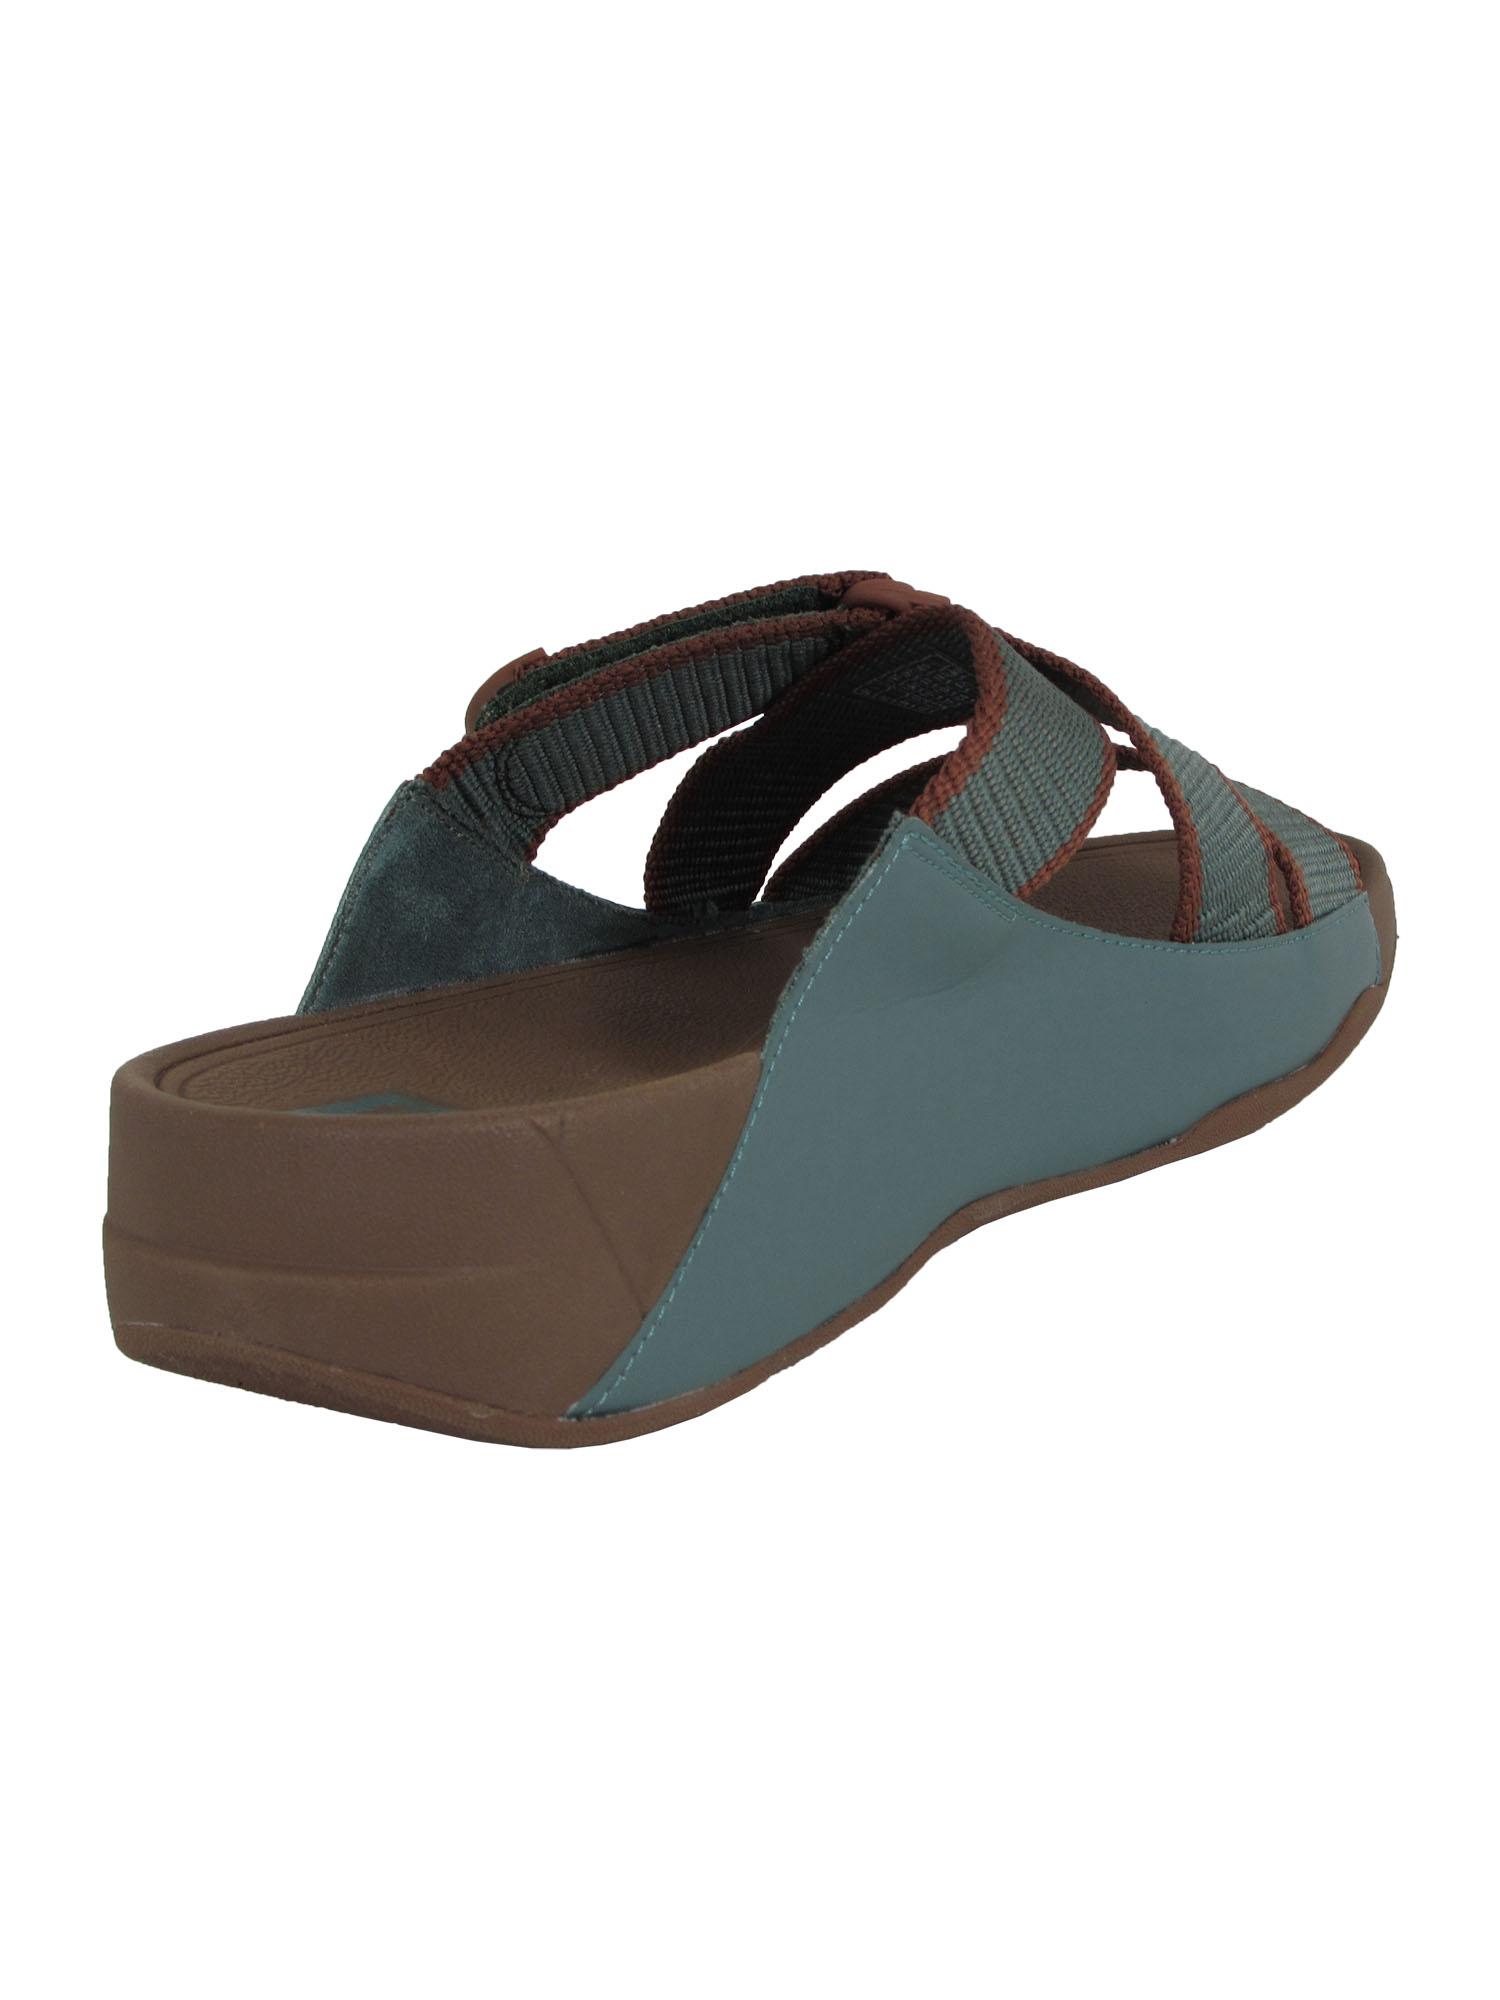 Fitflop-Mens-Sling-II-Webbing-Slide-Sandal-Shoes thumbnail 4